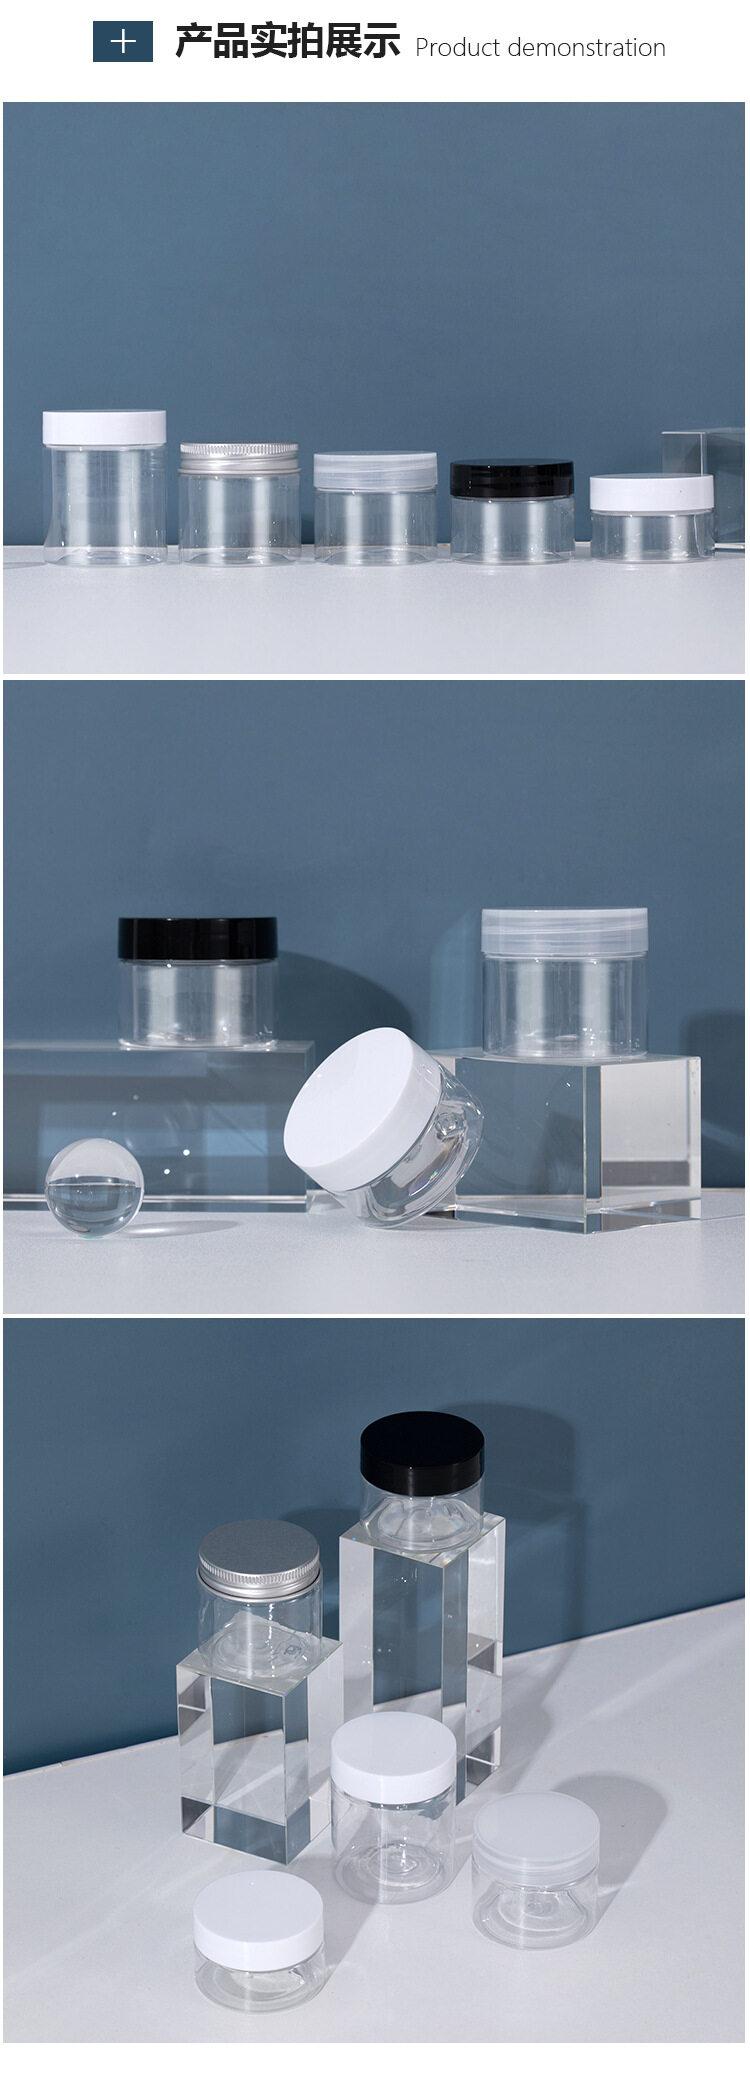 Cream Bottle Jar Cosmetics Storage Bottle Pet Sealed Plastic Cans Cream Bottle DCH472 4